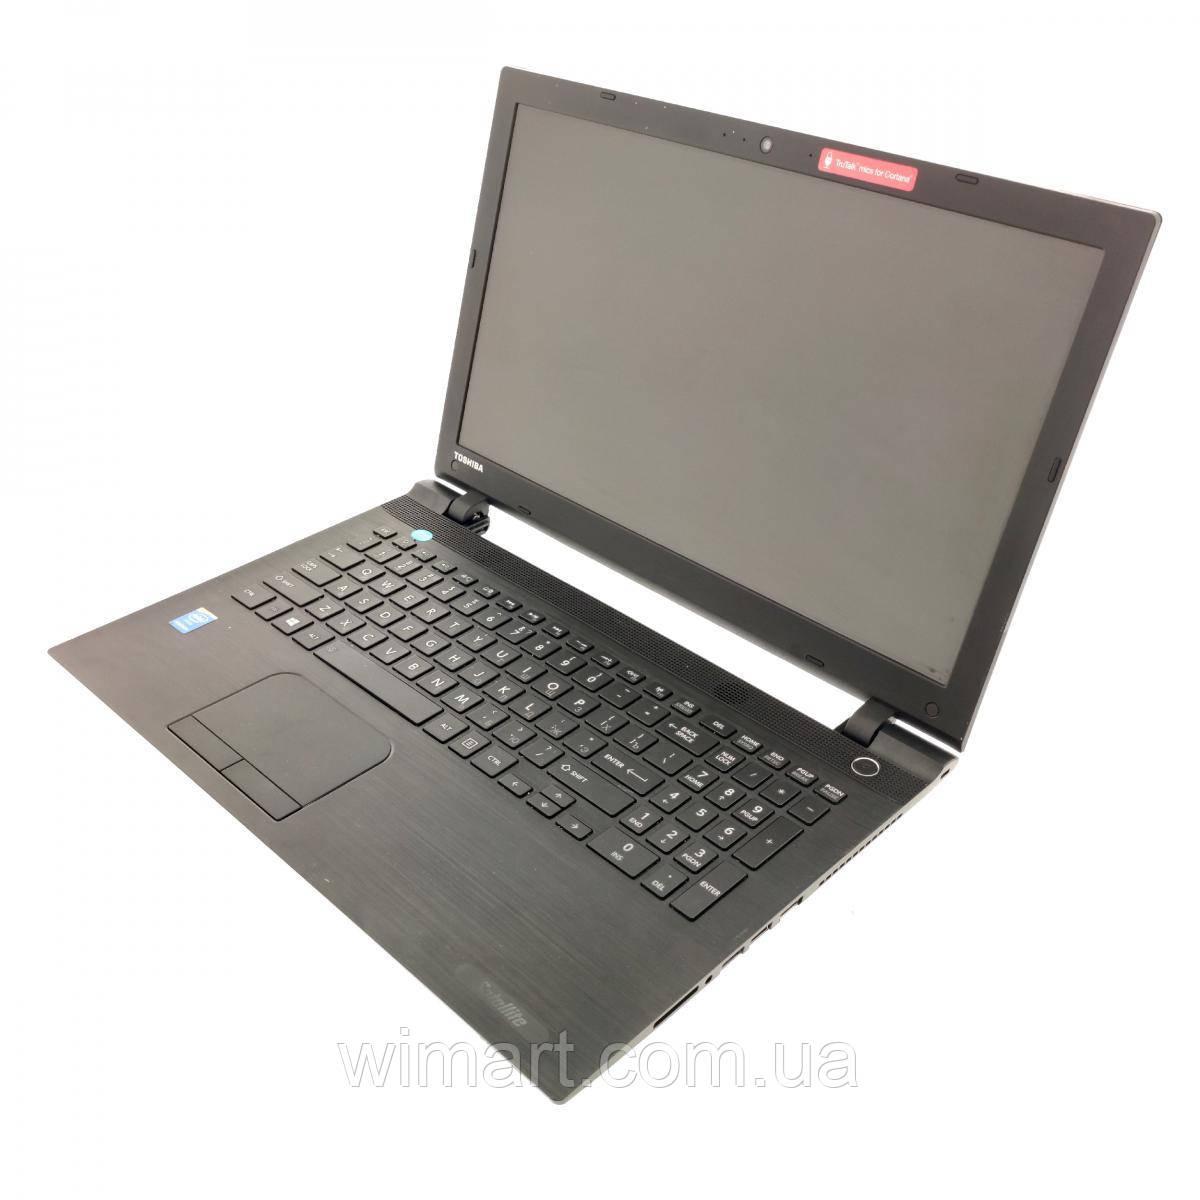 "Б/У Ноутбук Toshiba c55-c5268 15.6"" Intel Pentium N3700 2GB DDR3 noHDD"